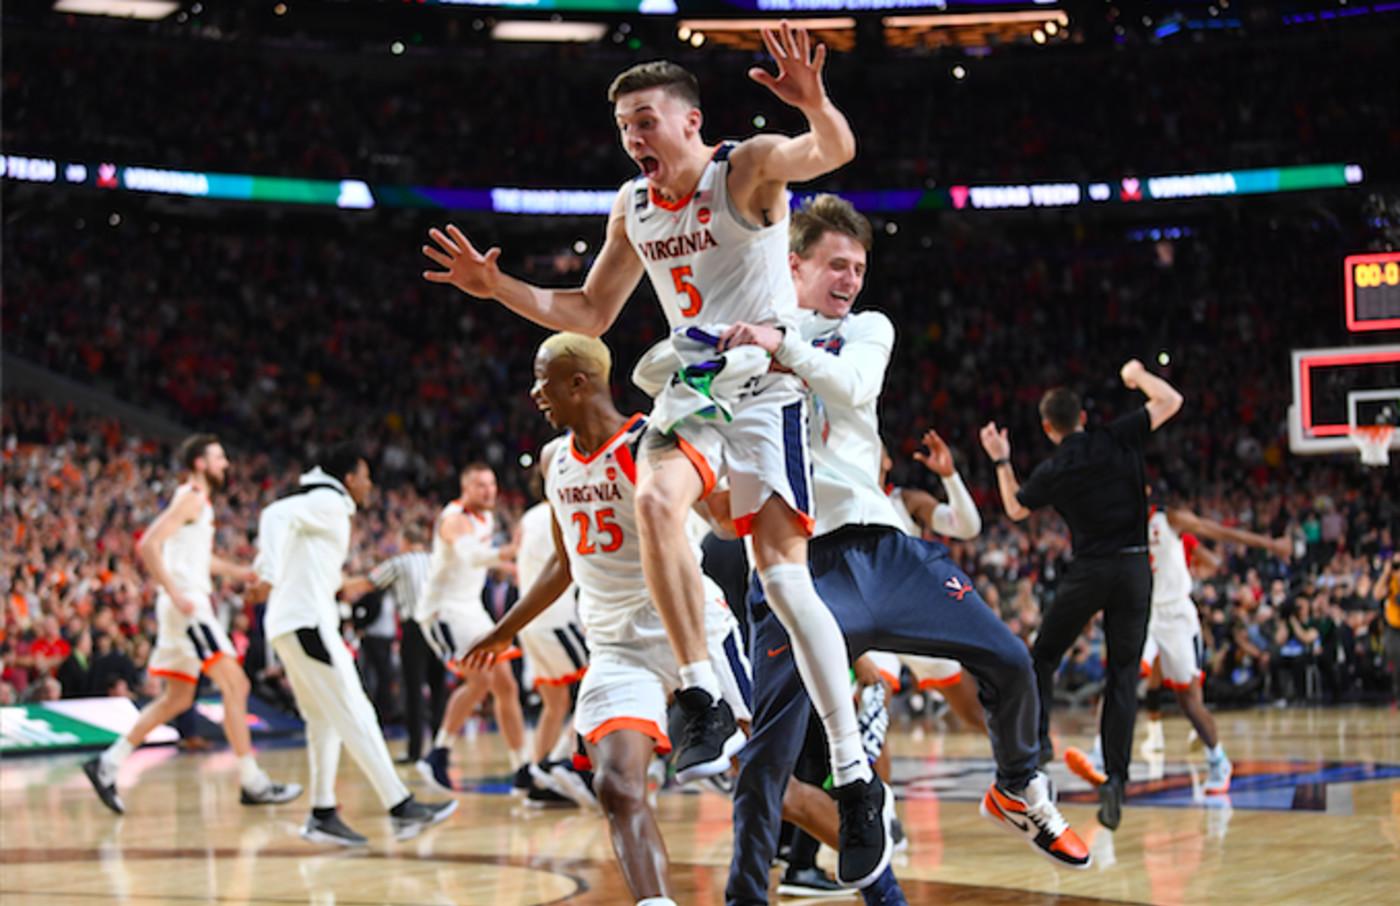 University of Virginia men's basketball team